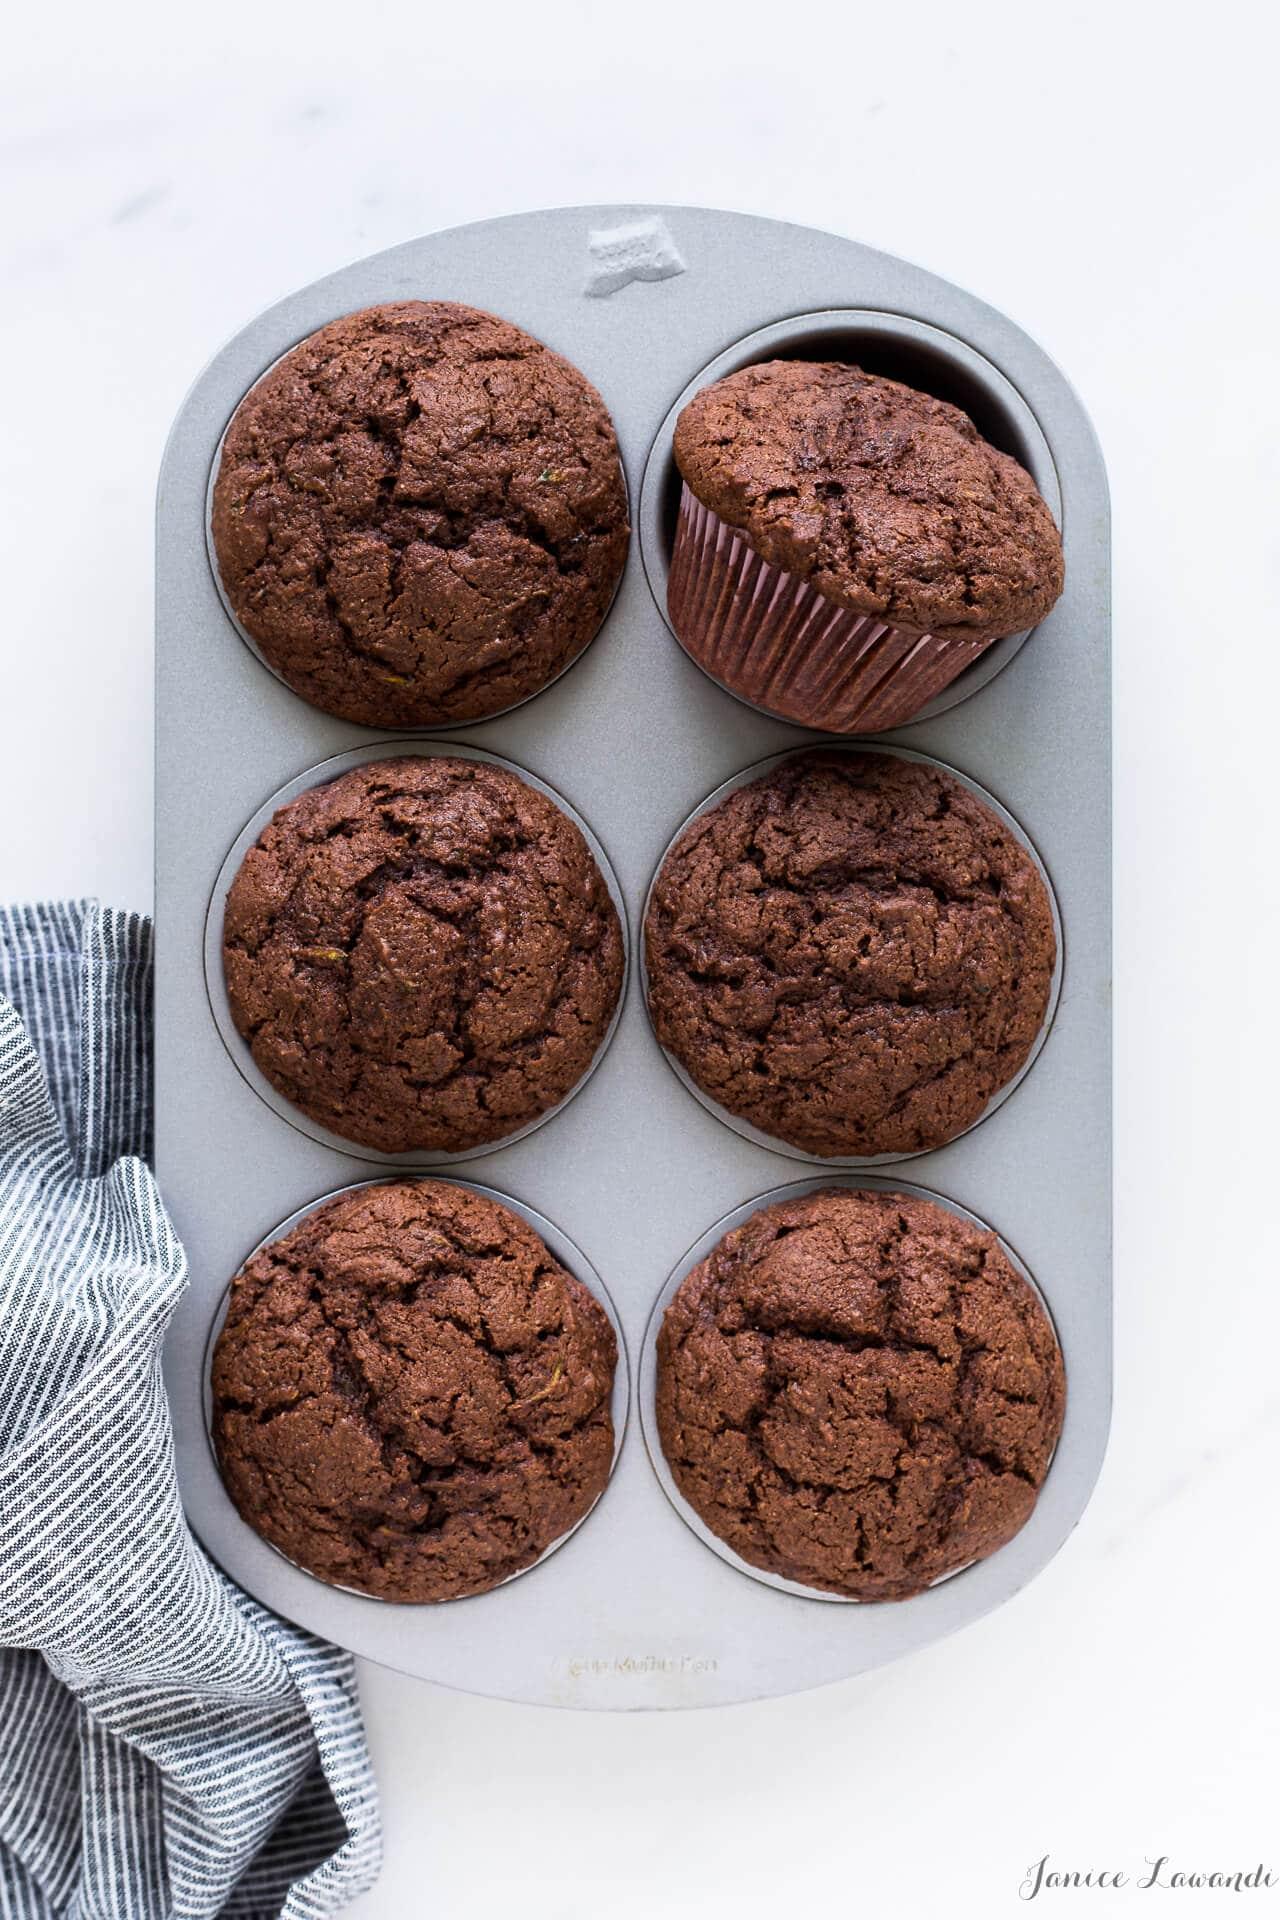 Zucchini chocolate muffins baked